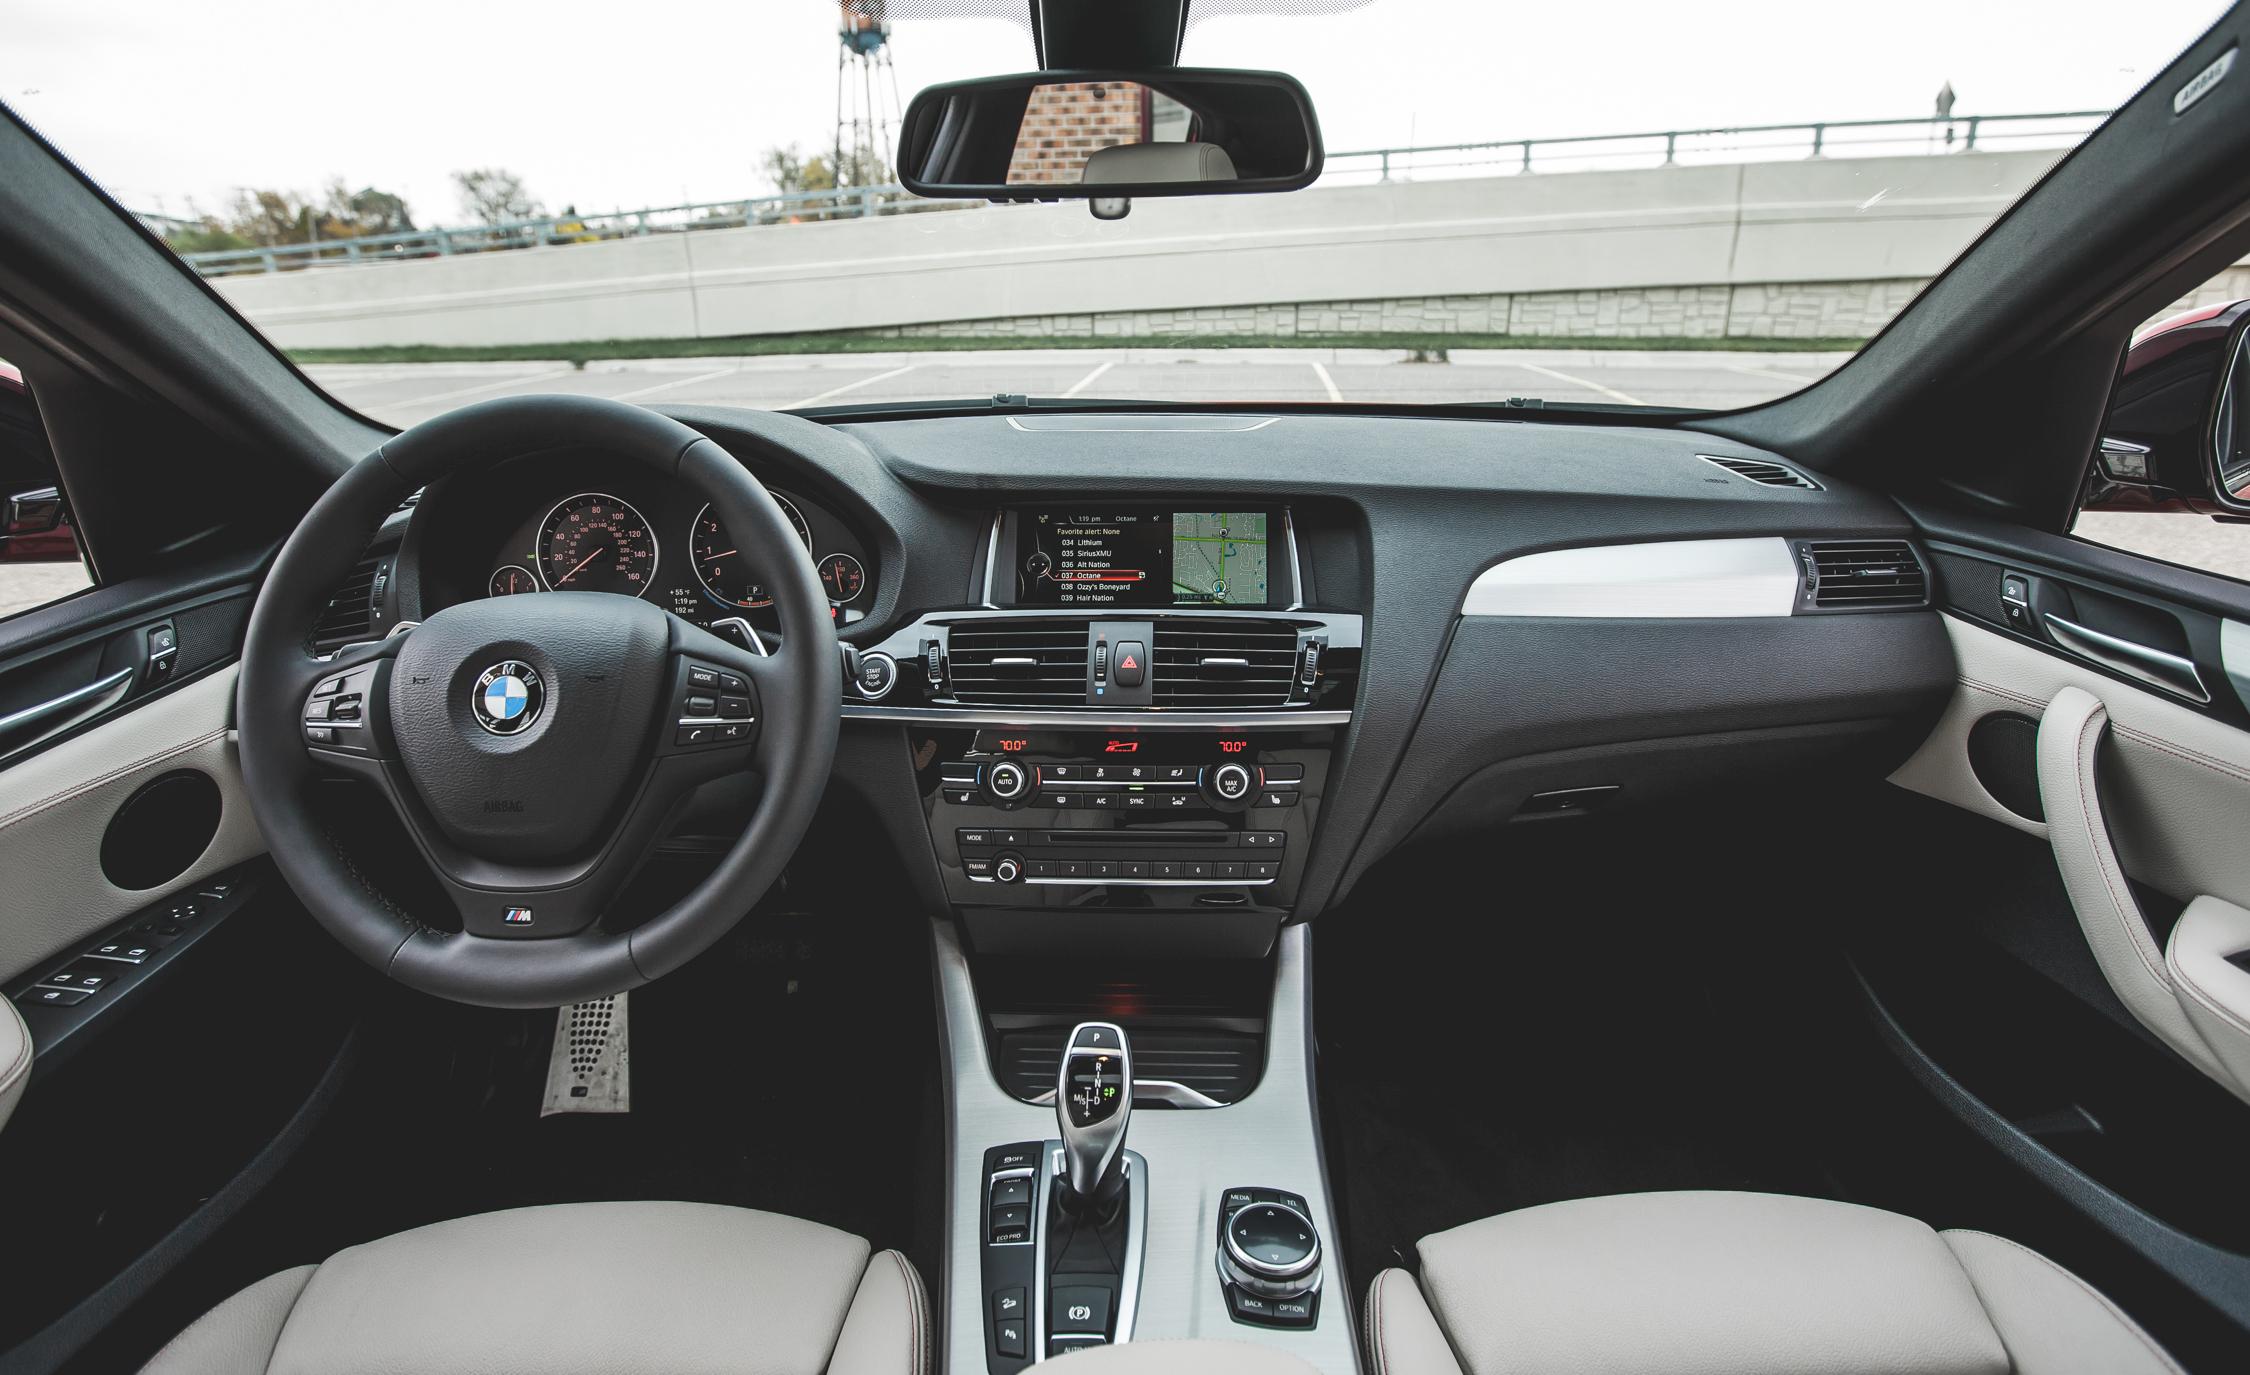 2015 BMW X4 xDrive28i Interior Front